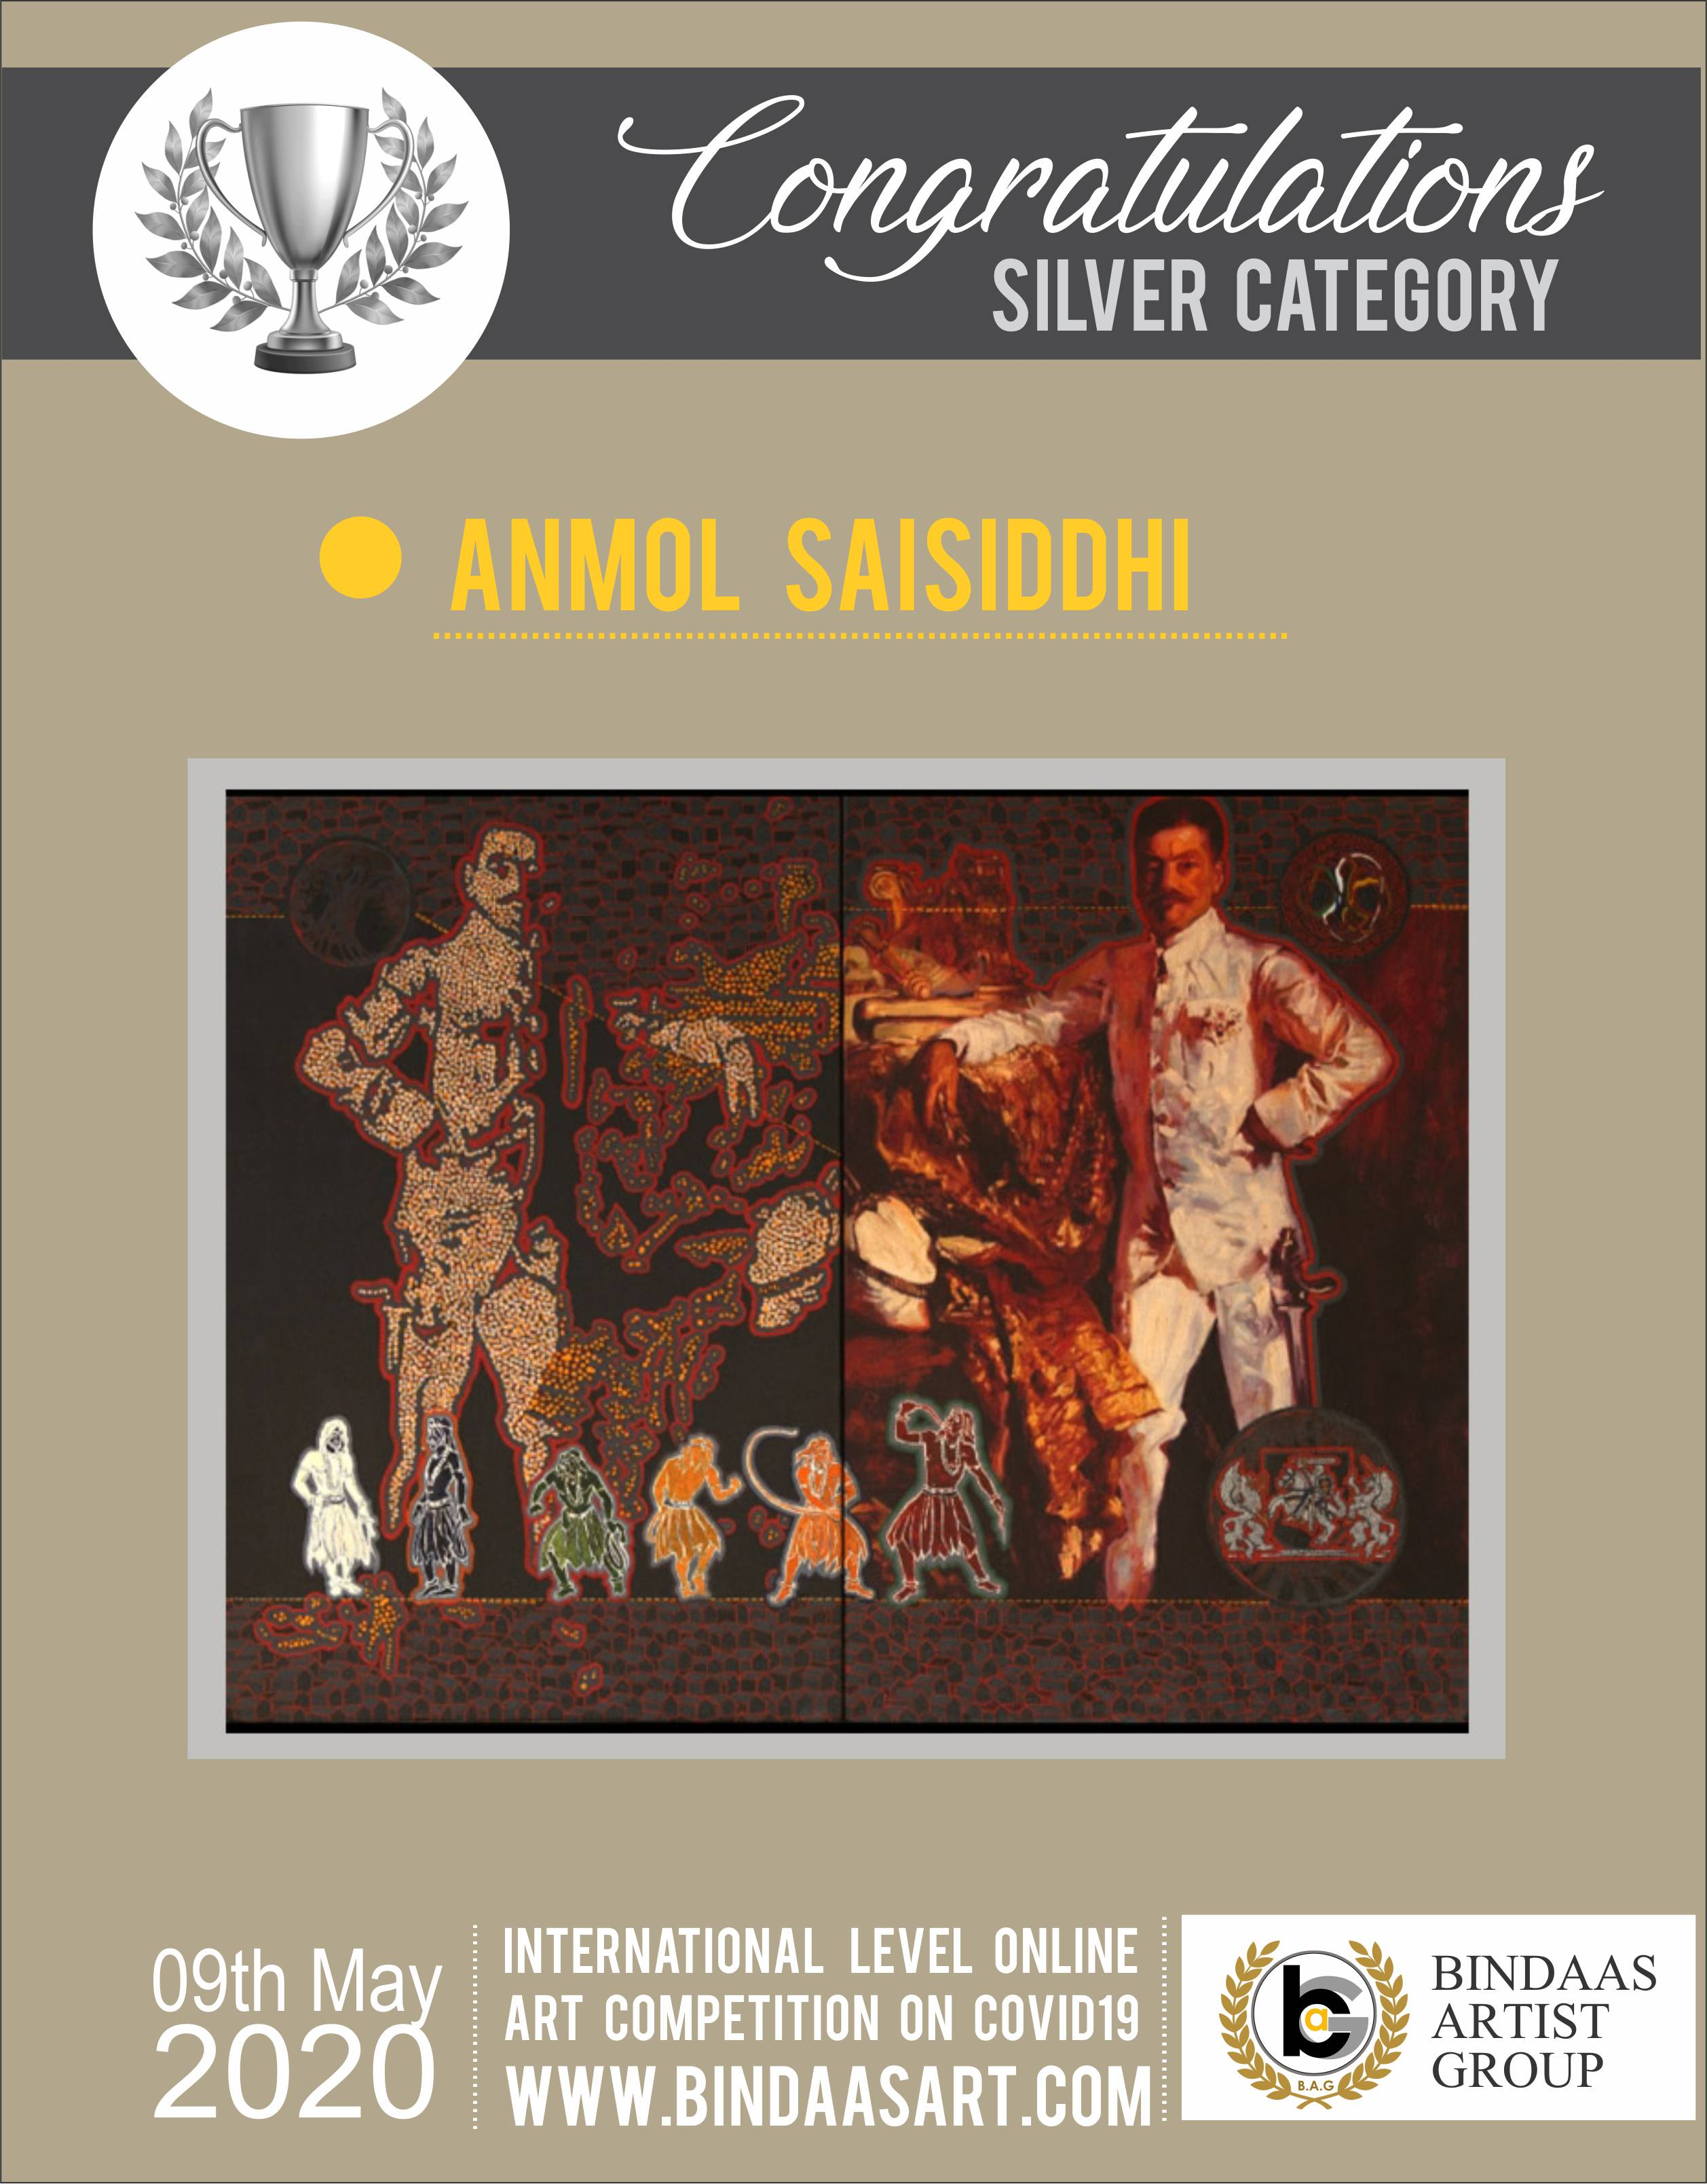 Anmol Saisiddhi